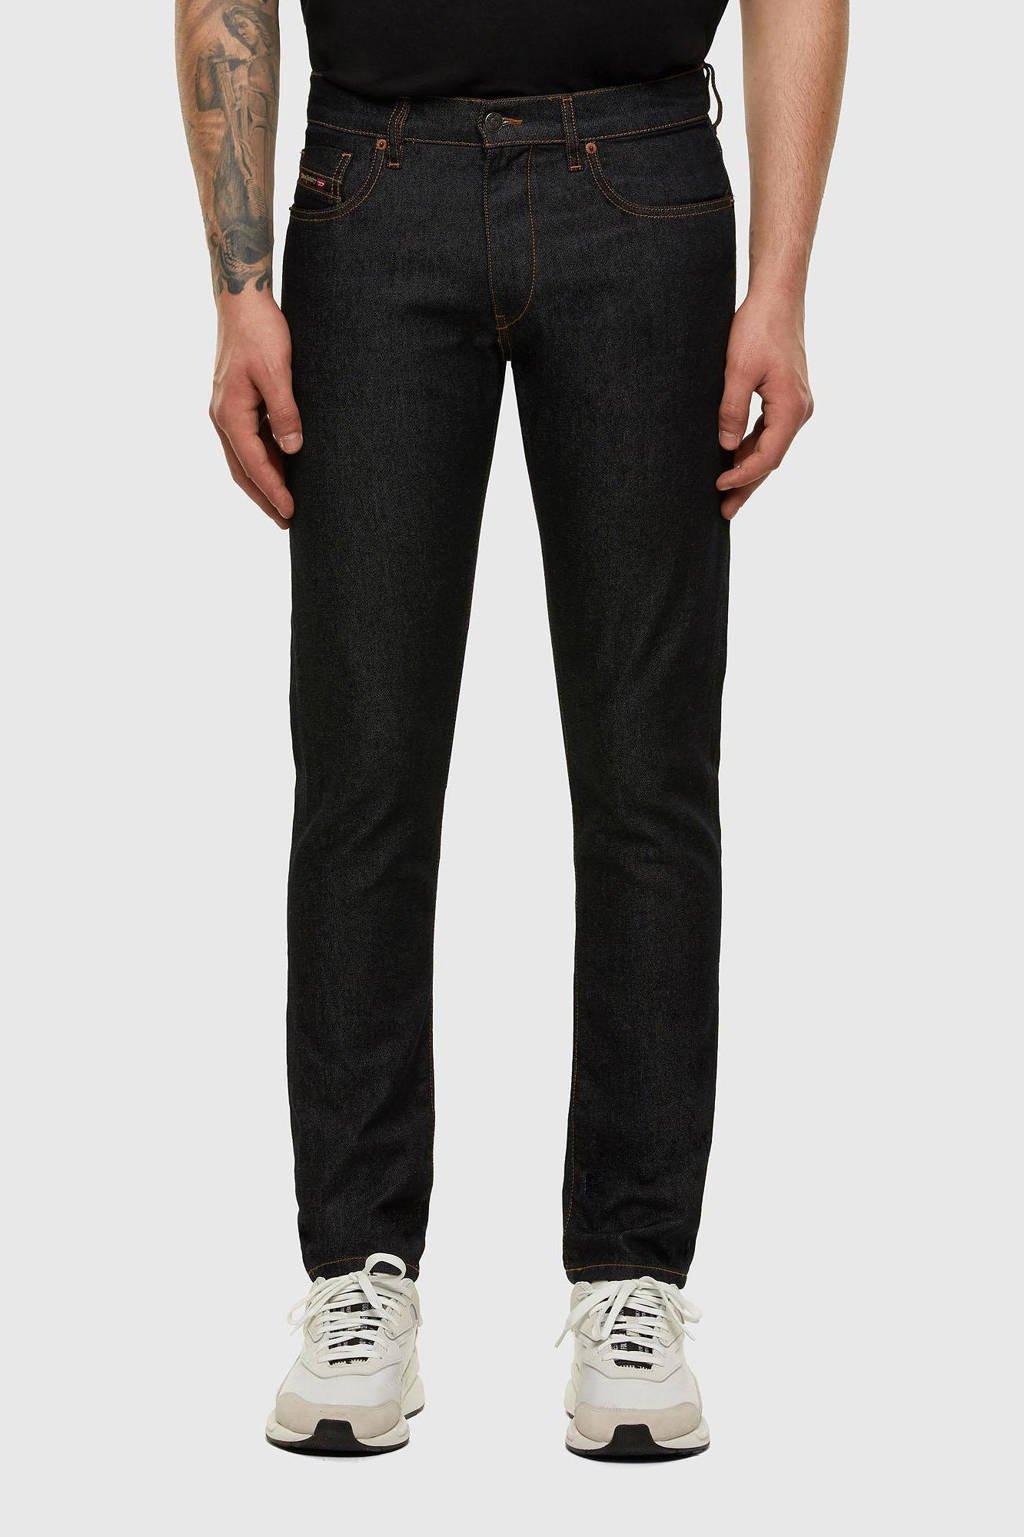 Diesel tapered fit jeans D-Strukt L34 donkerblauw, 01